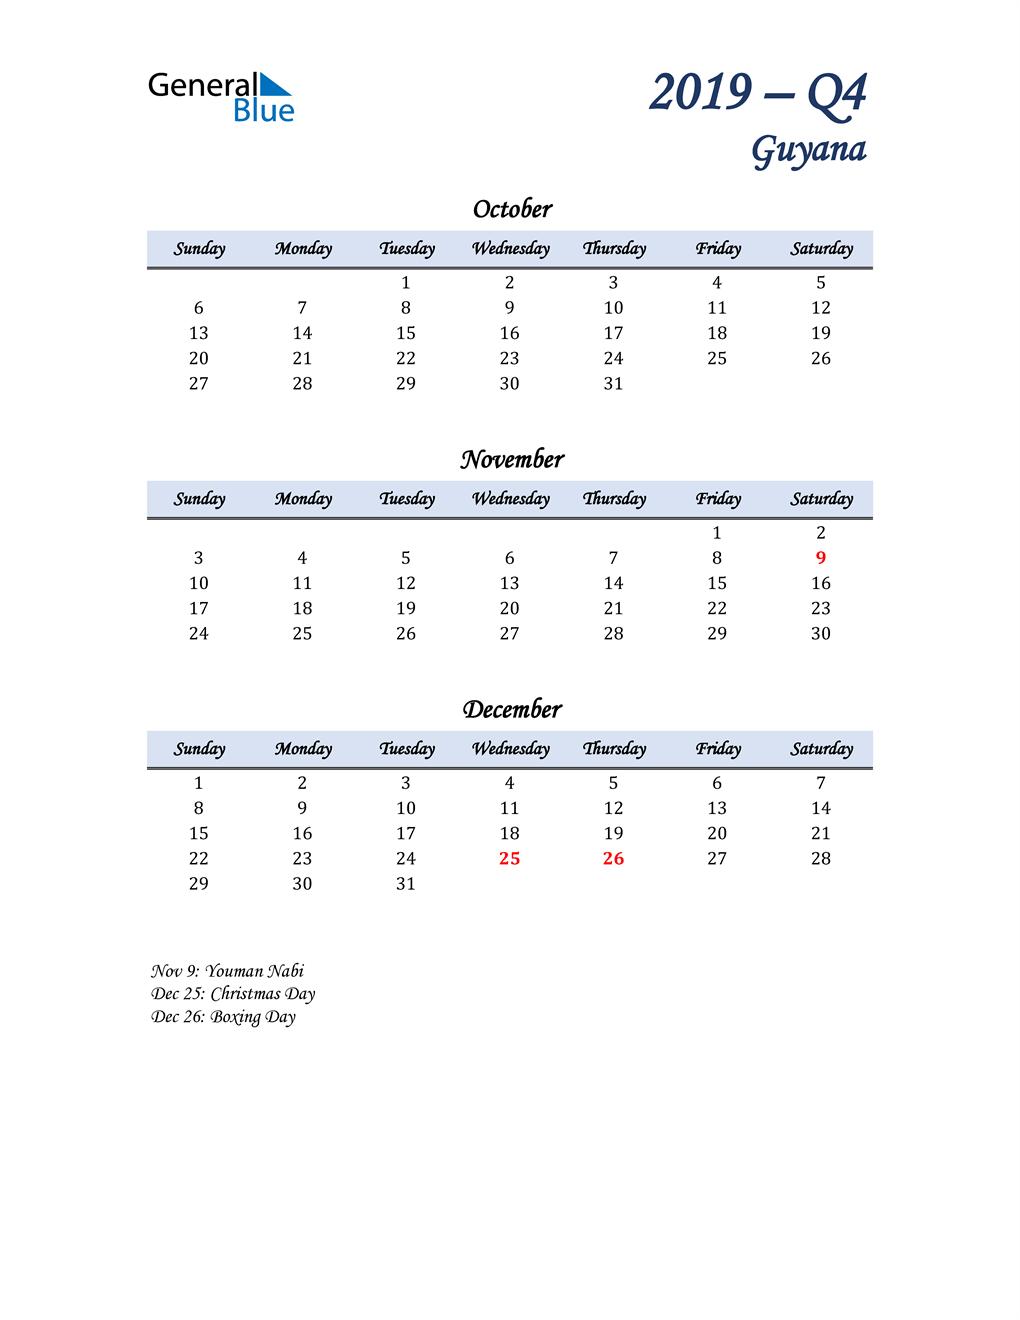 October, November, and December Calendar for Guyana